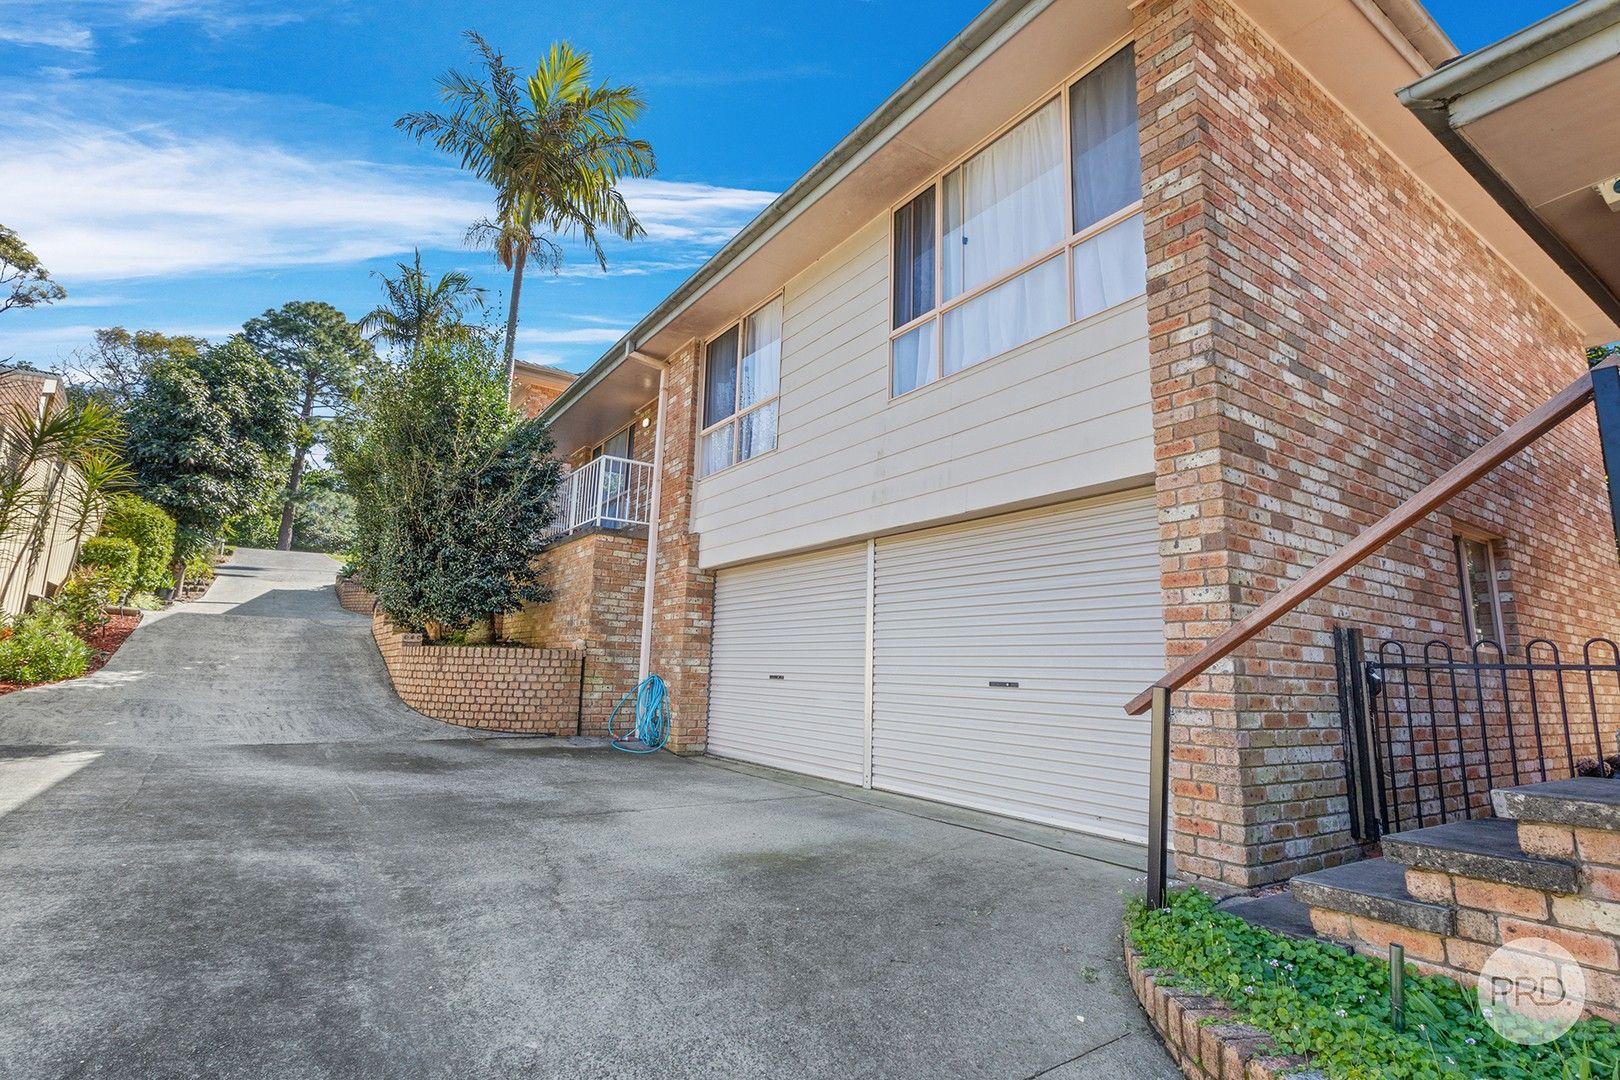 2/22 Yoolarai Crescent, Nelson Bay NSW 2315, Image 0